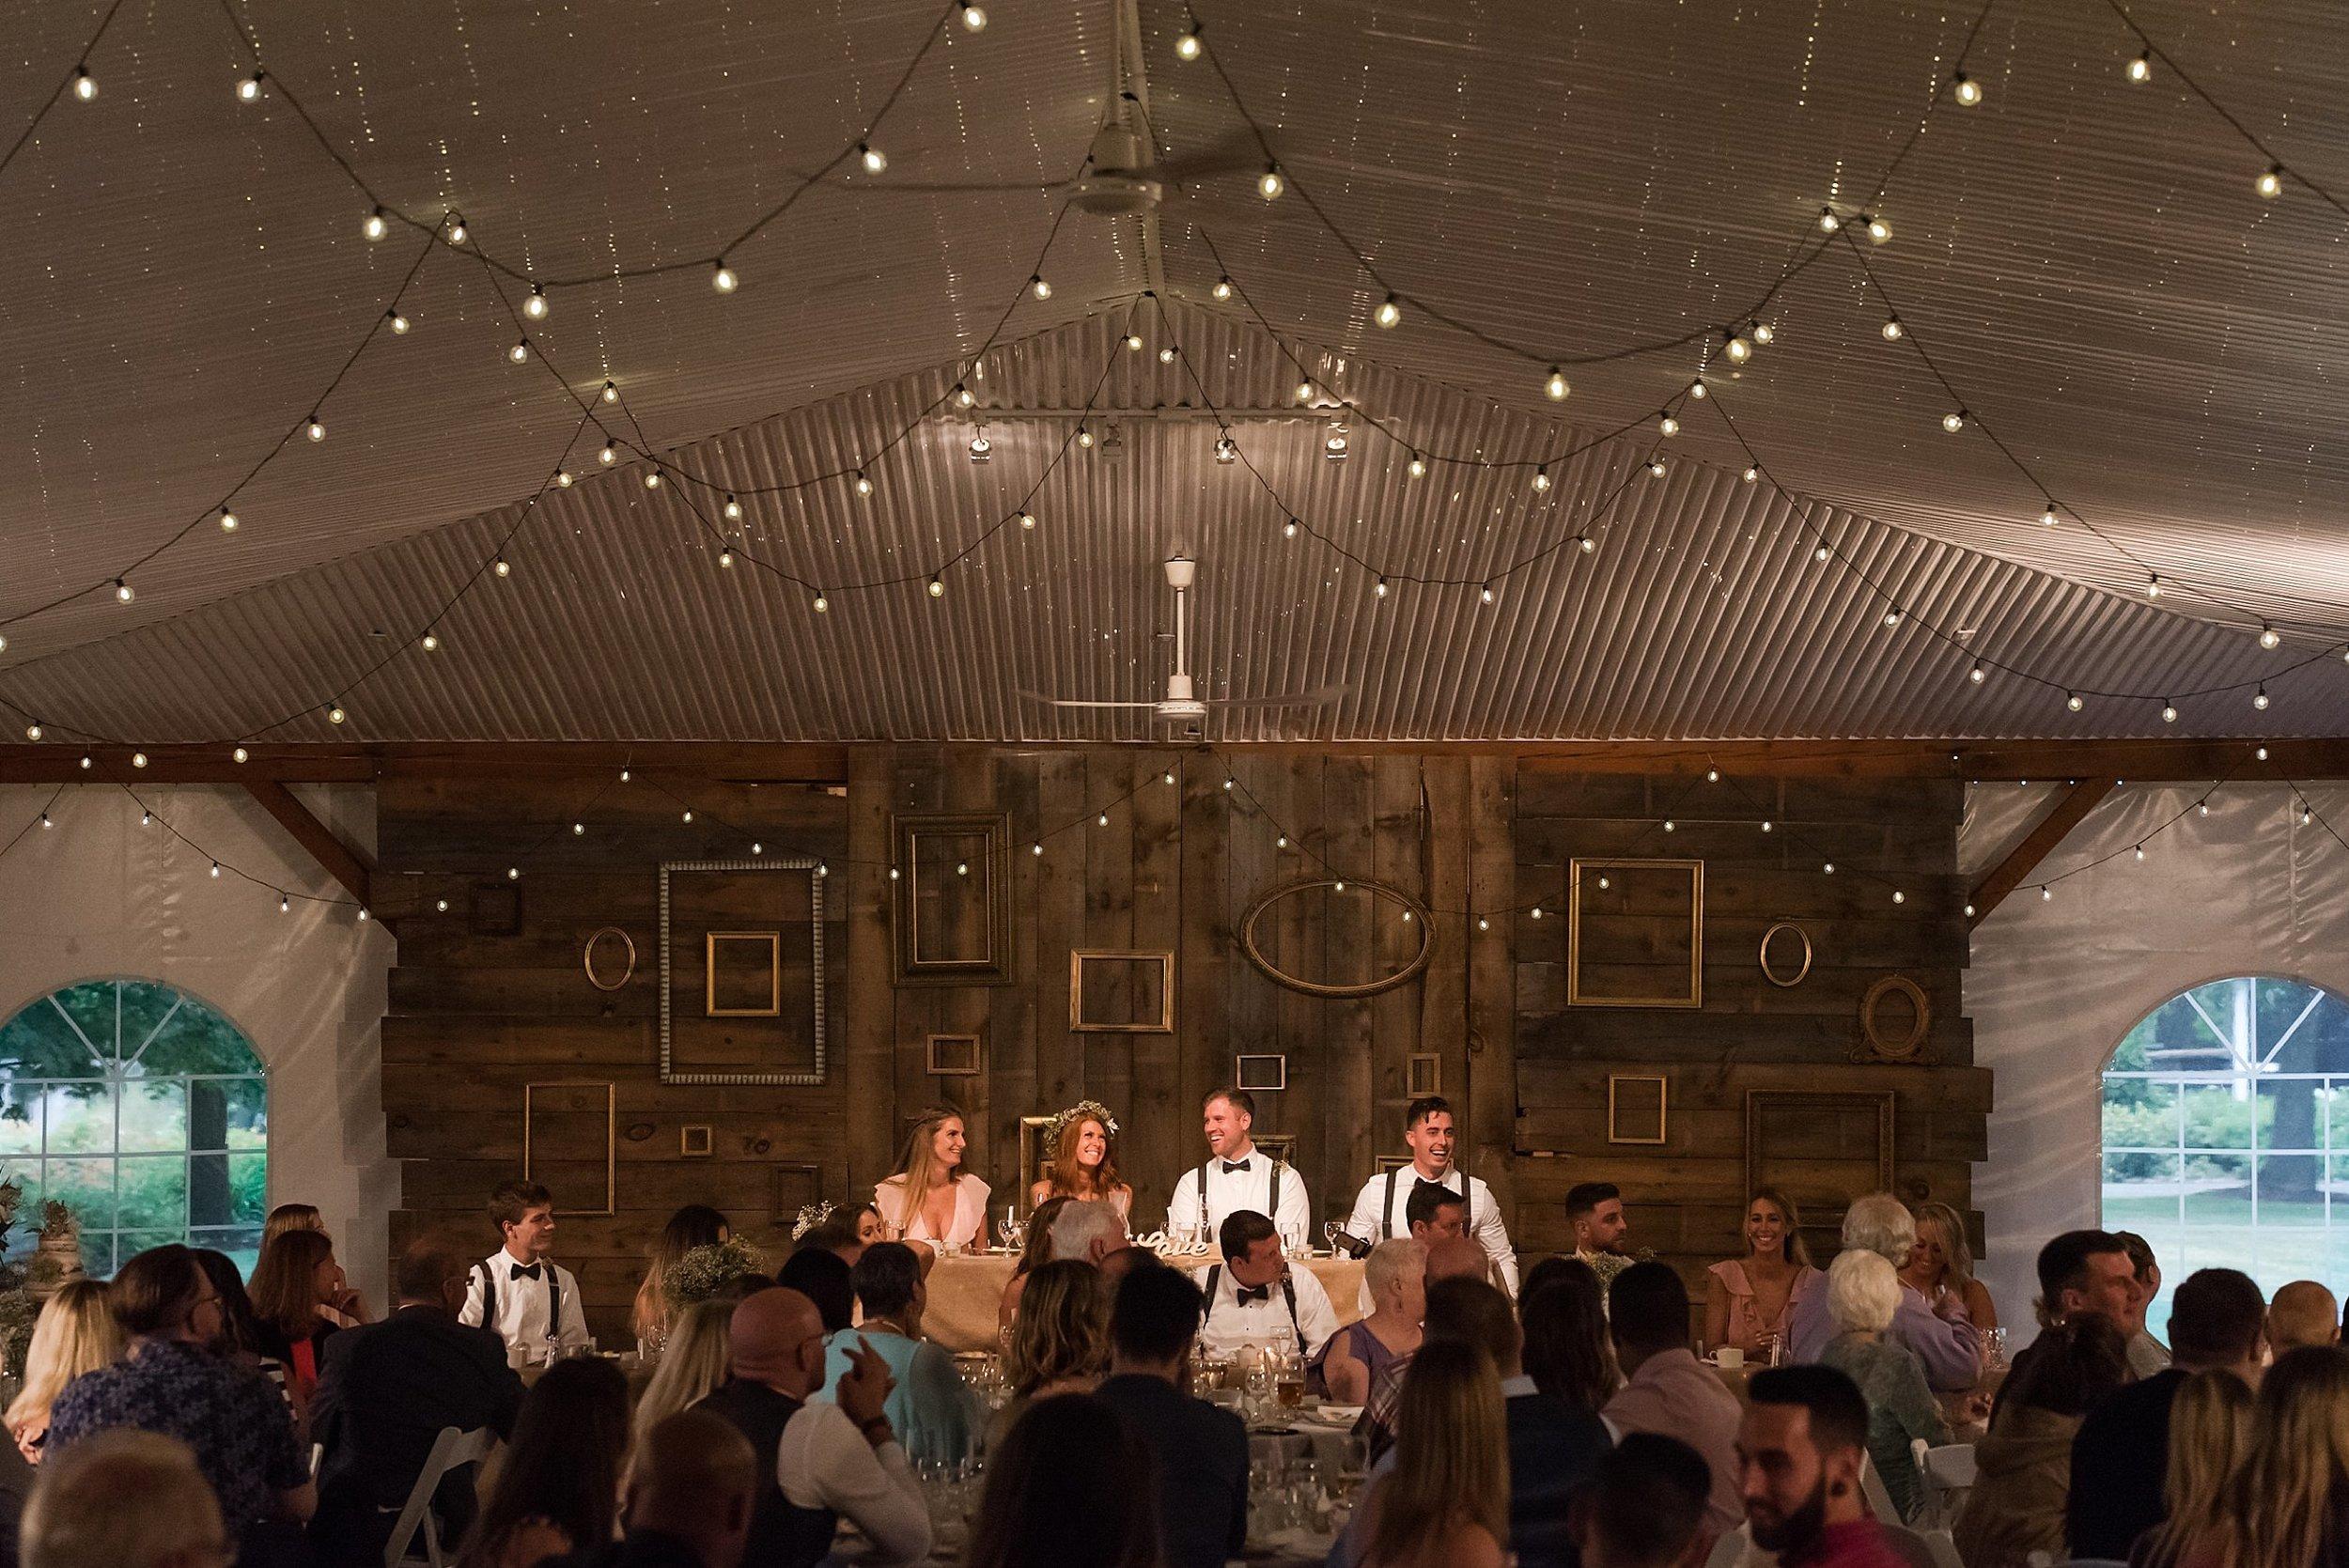 Ottawa Wedding Photographer - Stanley's Olde Maple Lane Barn Wedding - Ali & Batoul Photography_0061.jpg